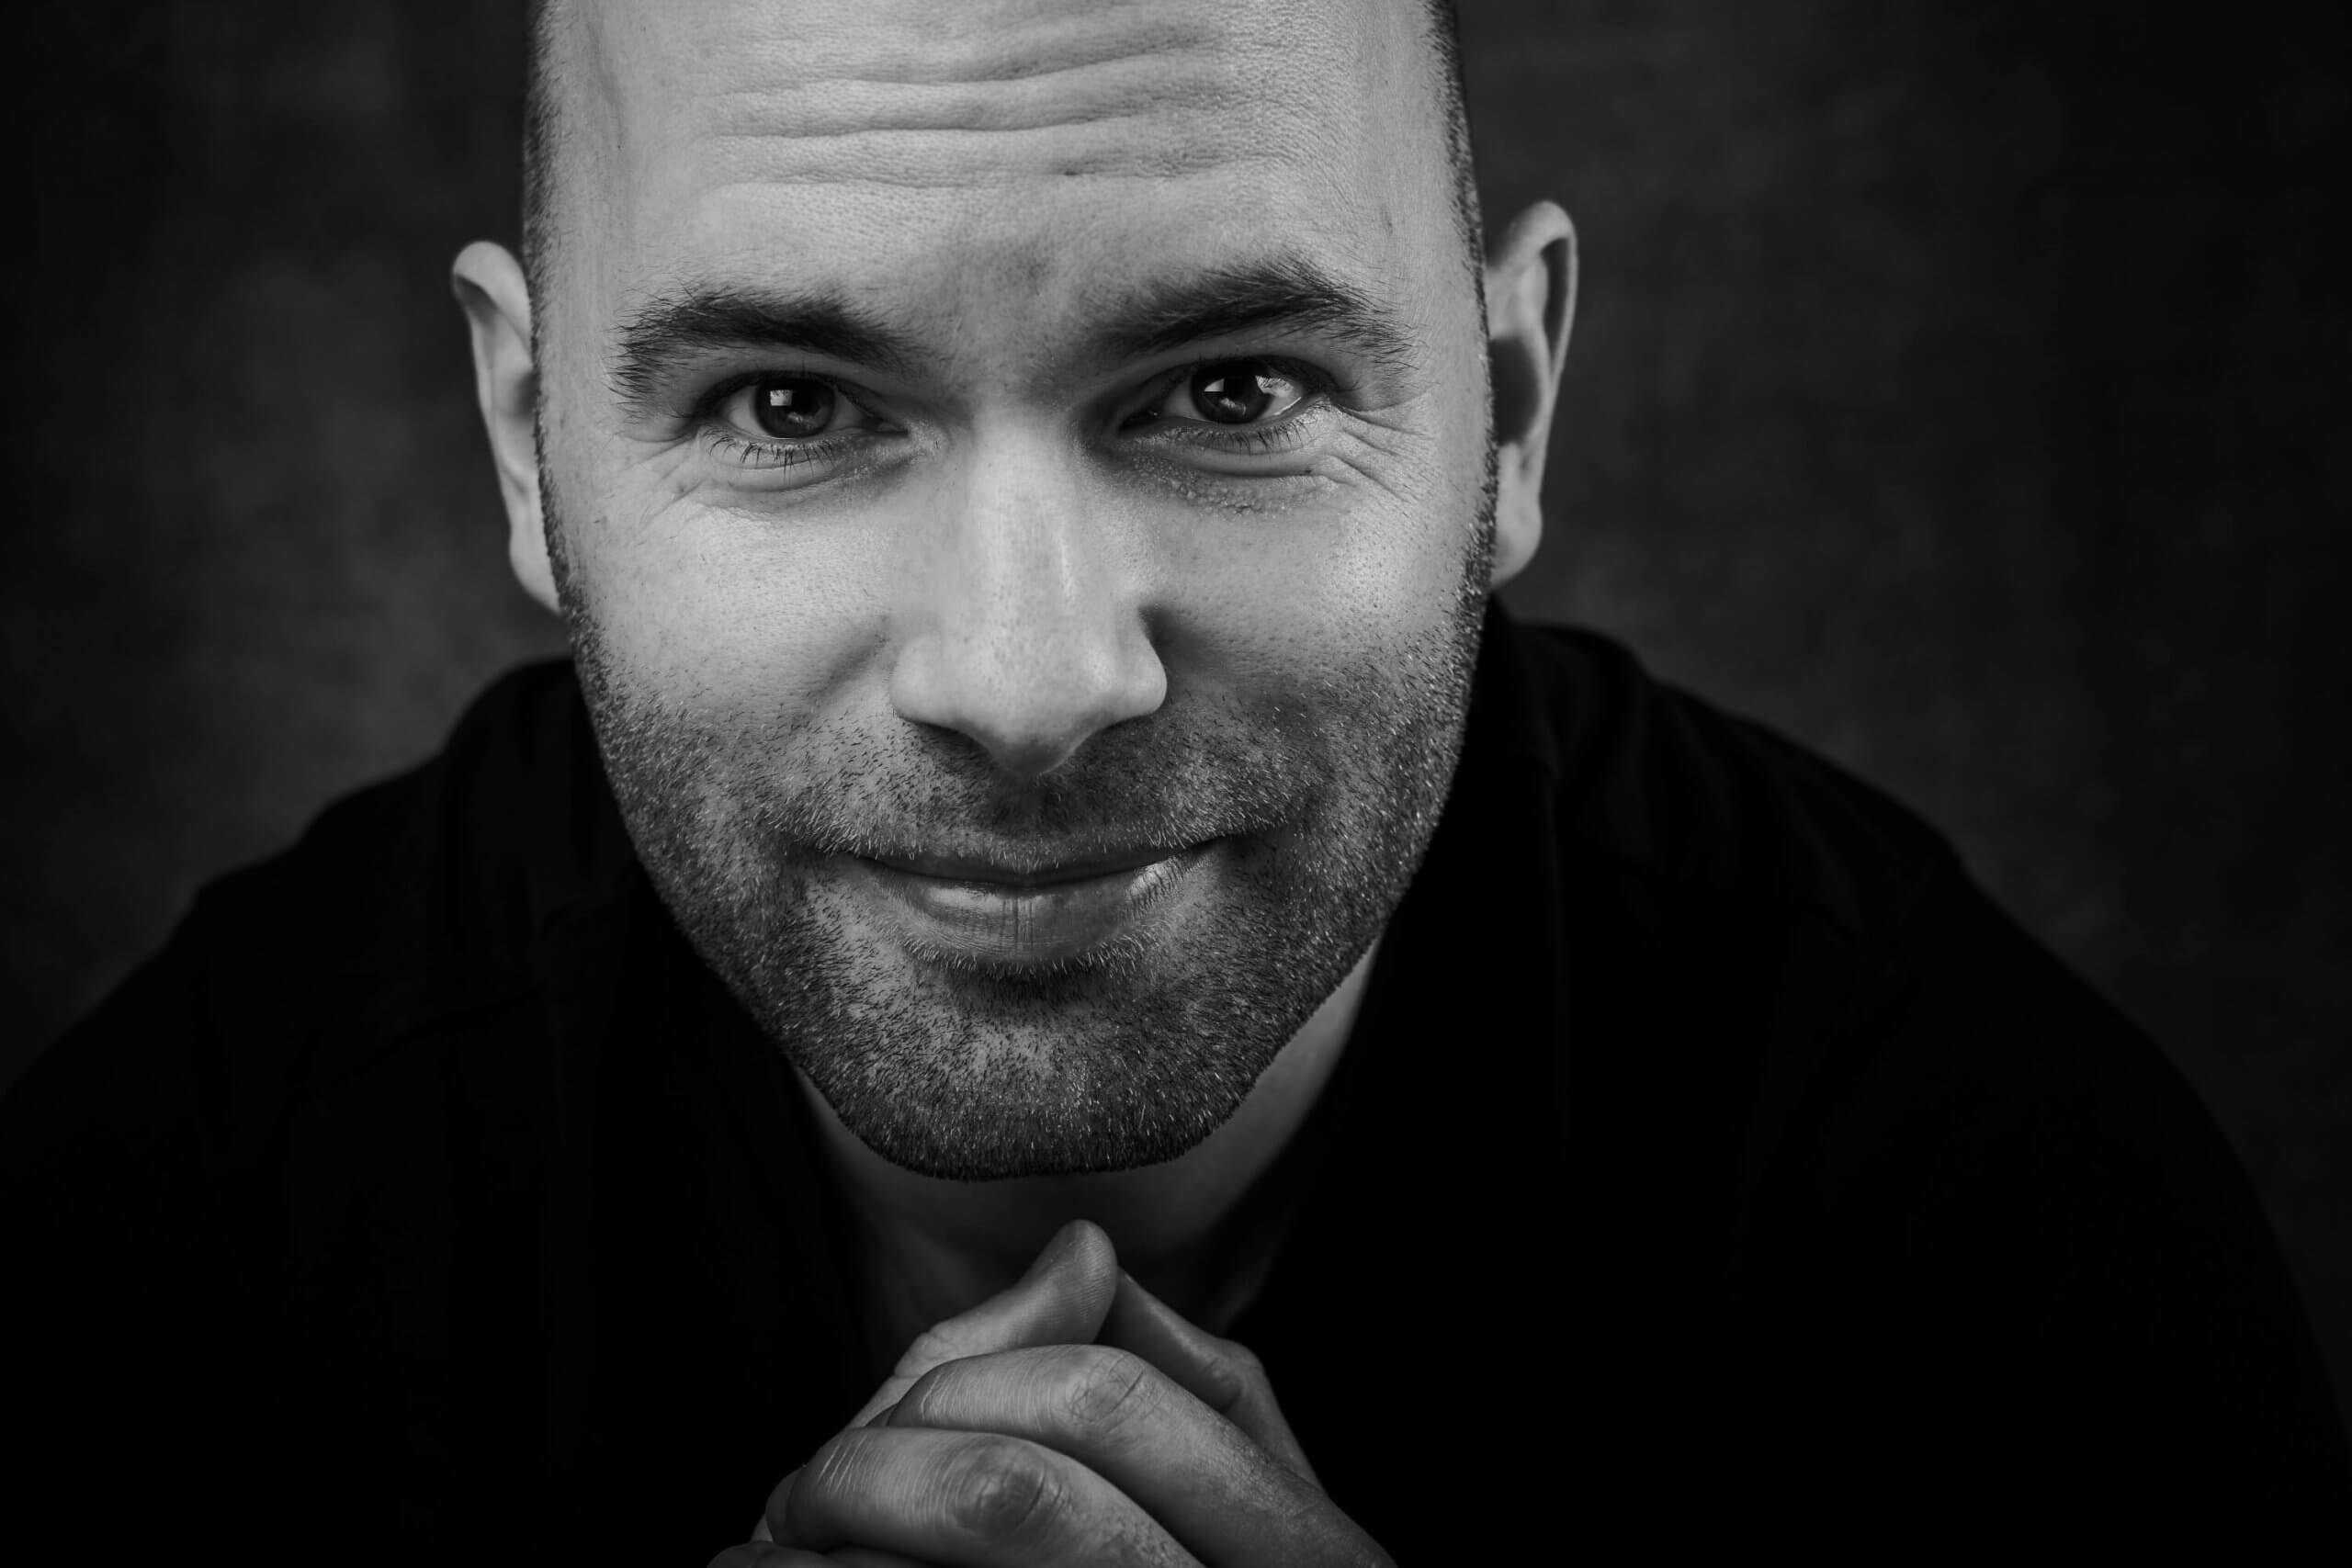 Portret black and white zwart wit studio lights